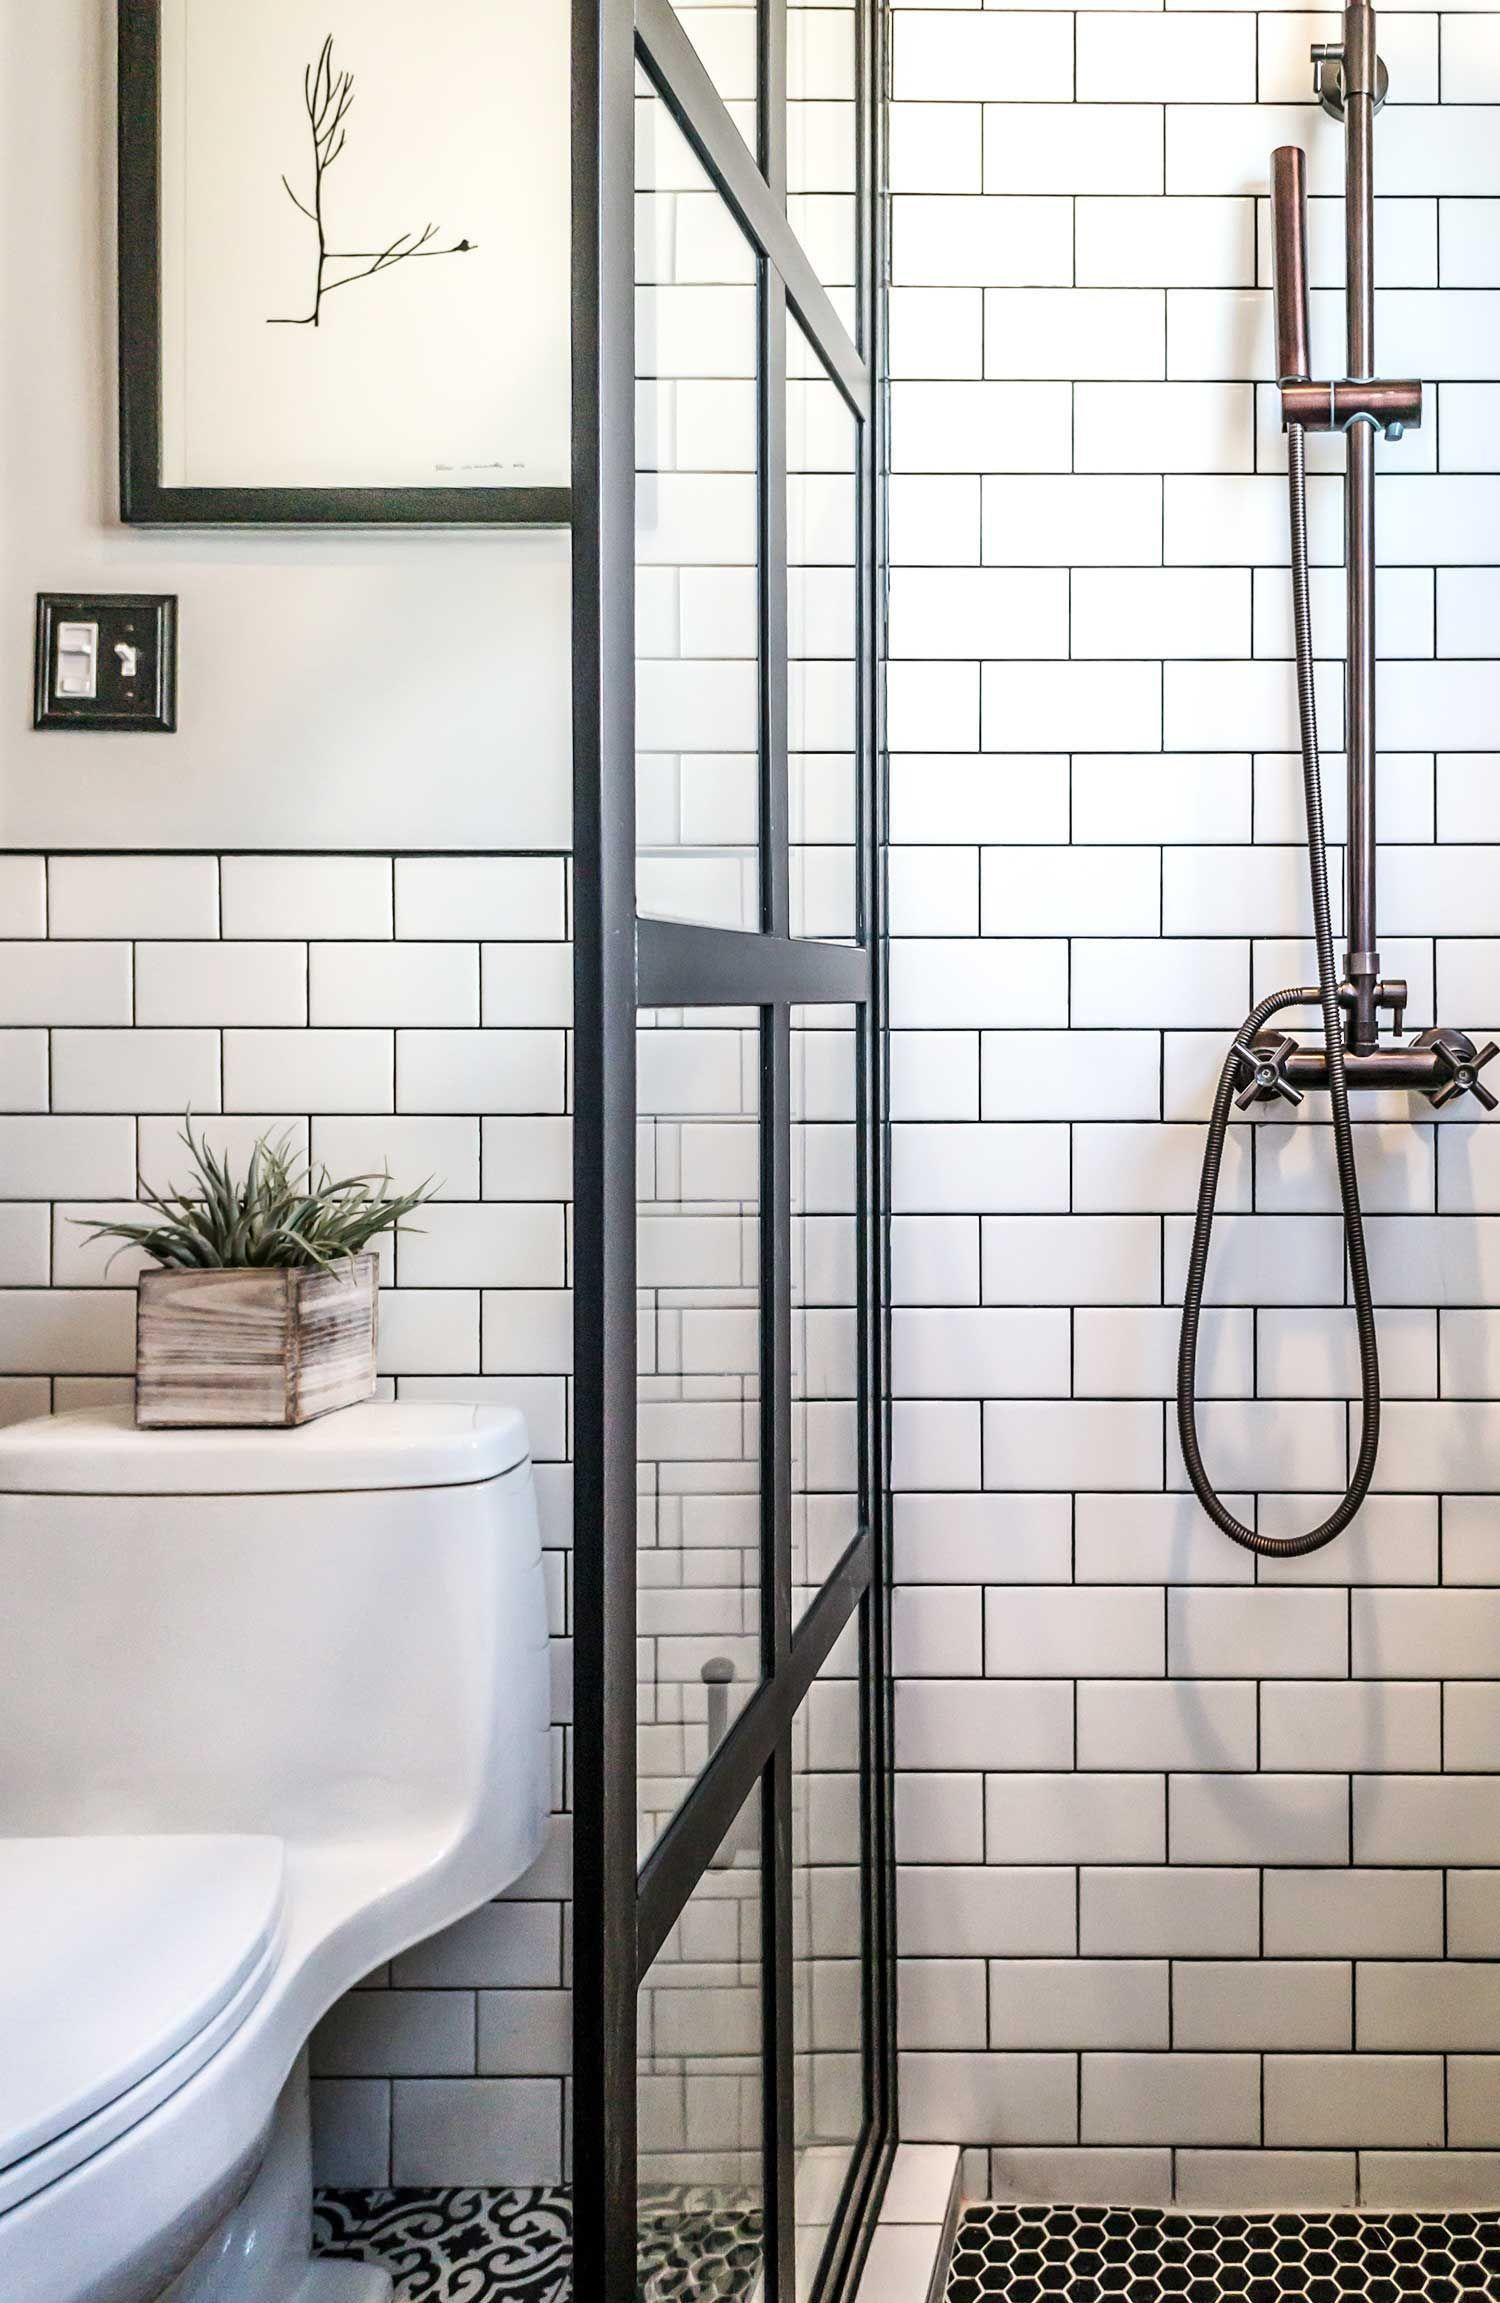 Bathroom Renovation Ideas Bathroom Remodel Cost, Bathroom Ideas For Small